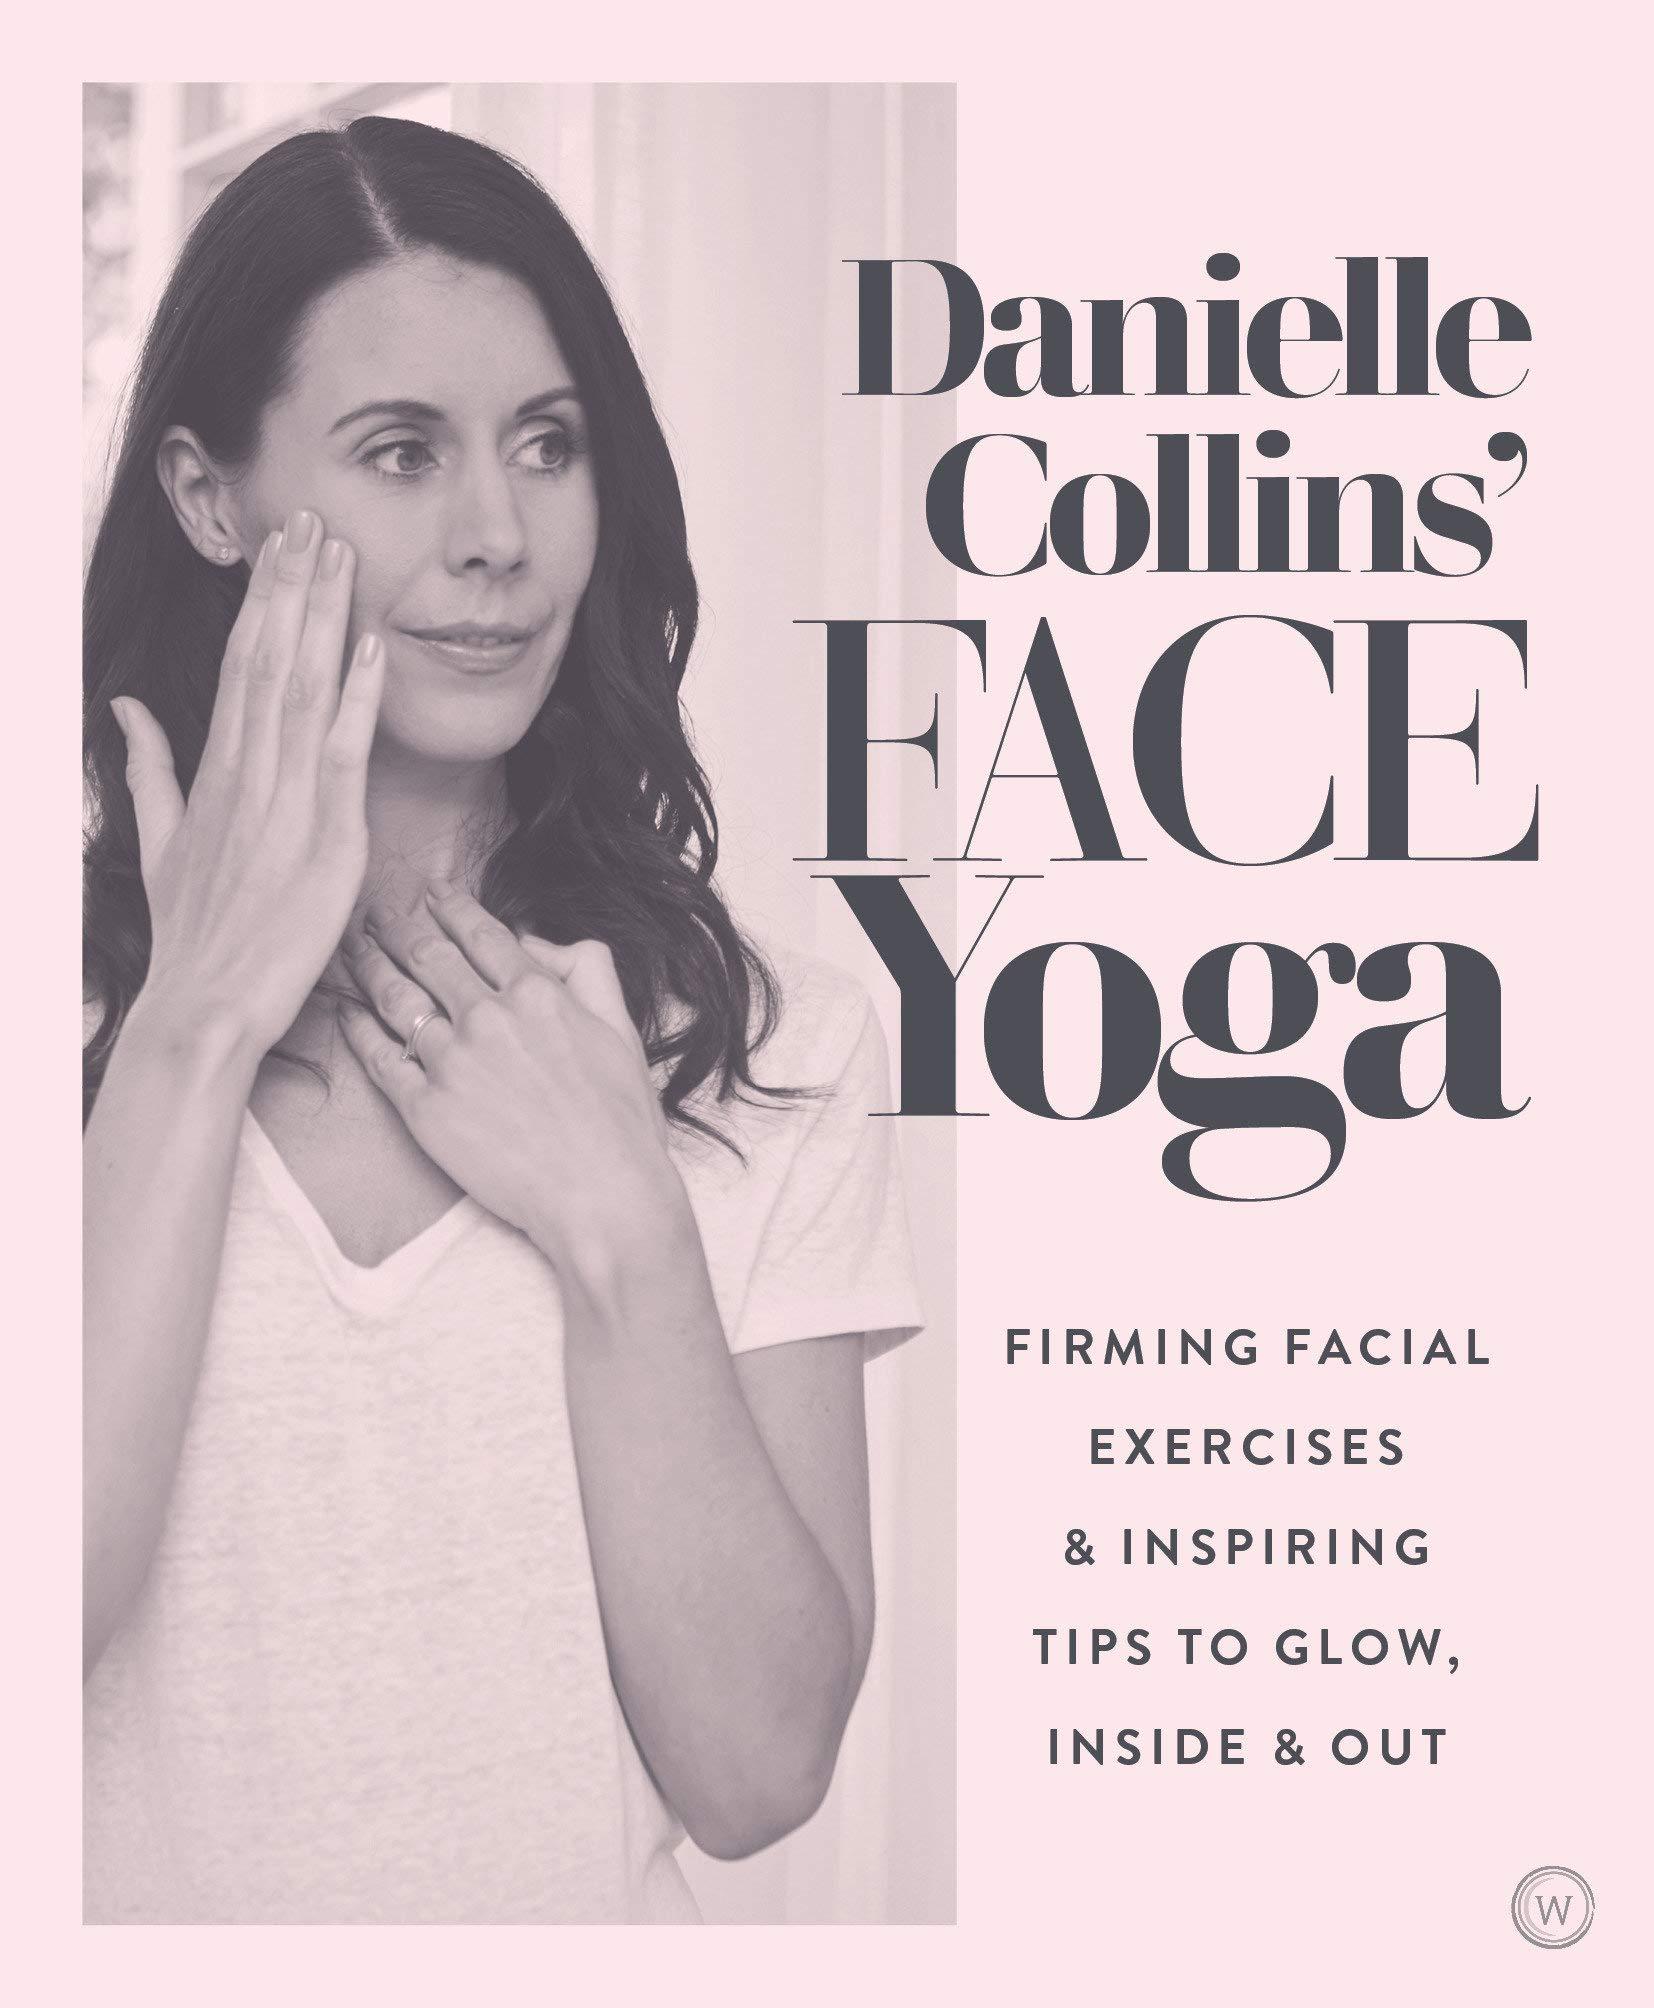 Danielle Collins Face Yoga Energizing product image